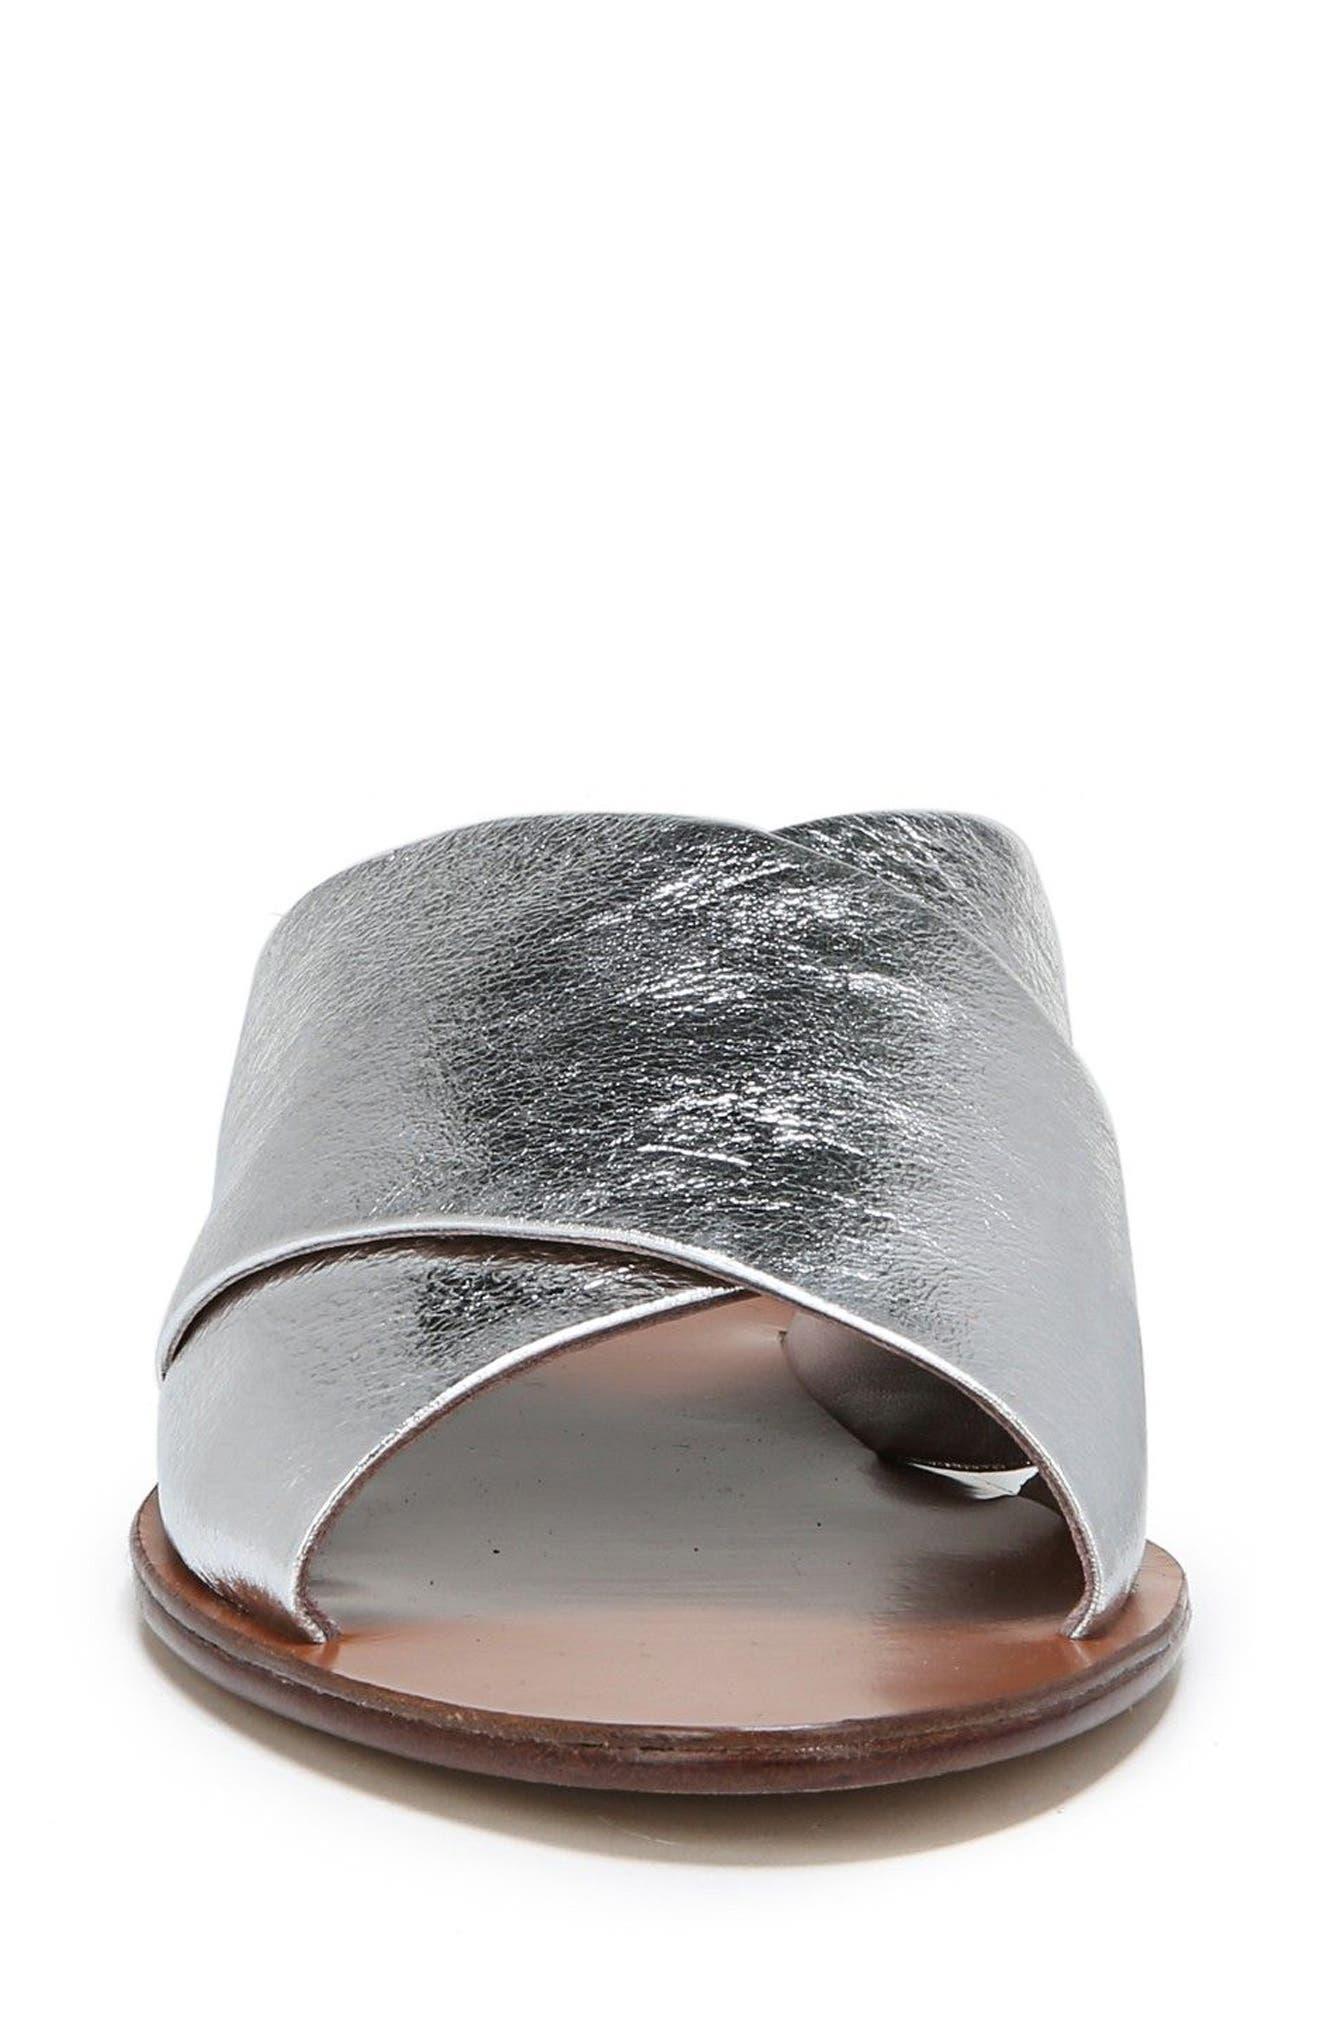 Bailie Sandal,                             Alternate thumbnail 5, color,                             Silver Leather